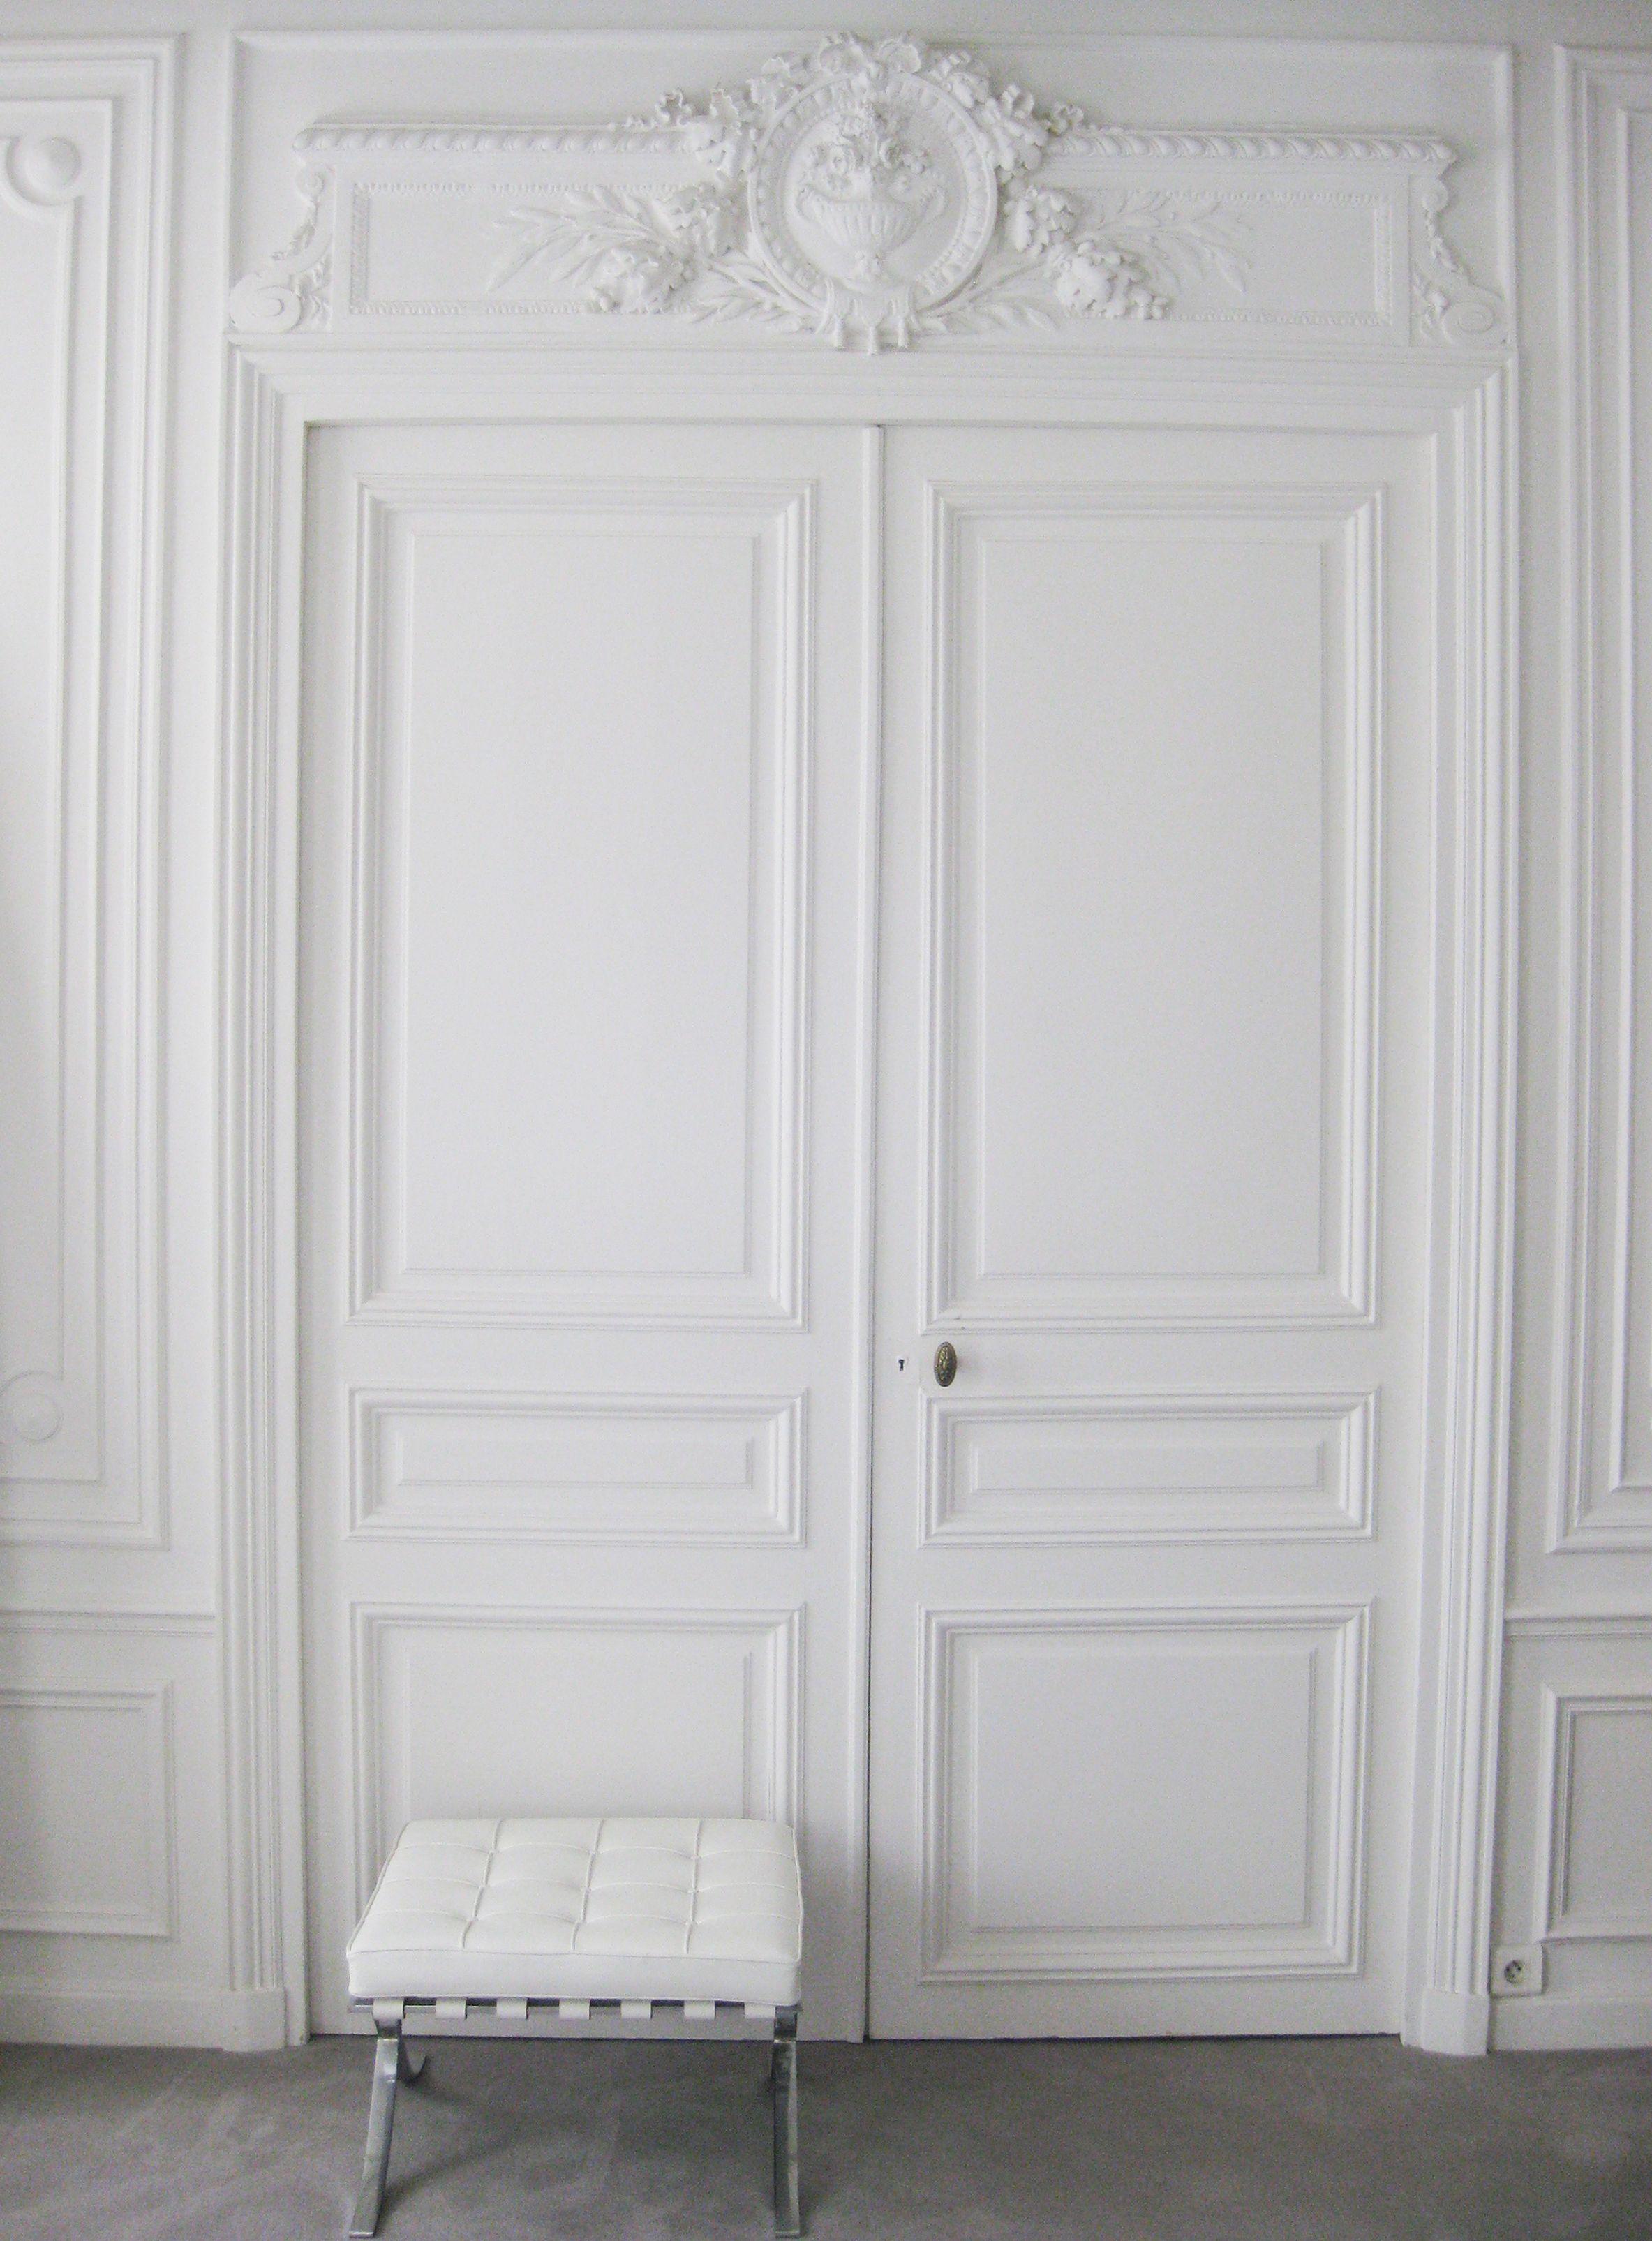 Bedroom Door Decorations Classical: Classical Parisian Interior Combined With Mies Van Der